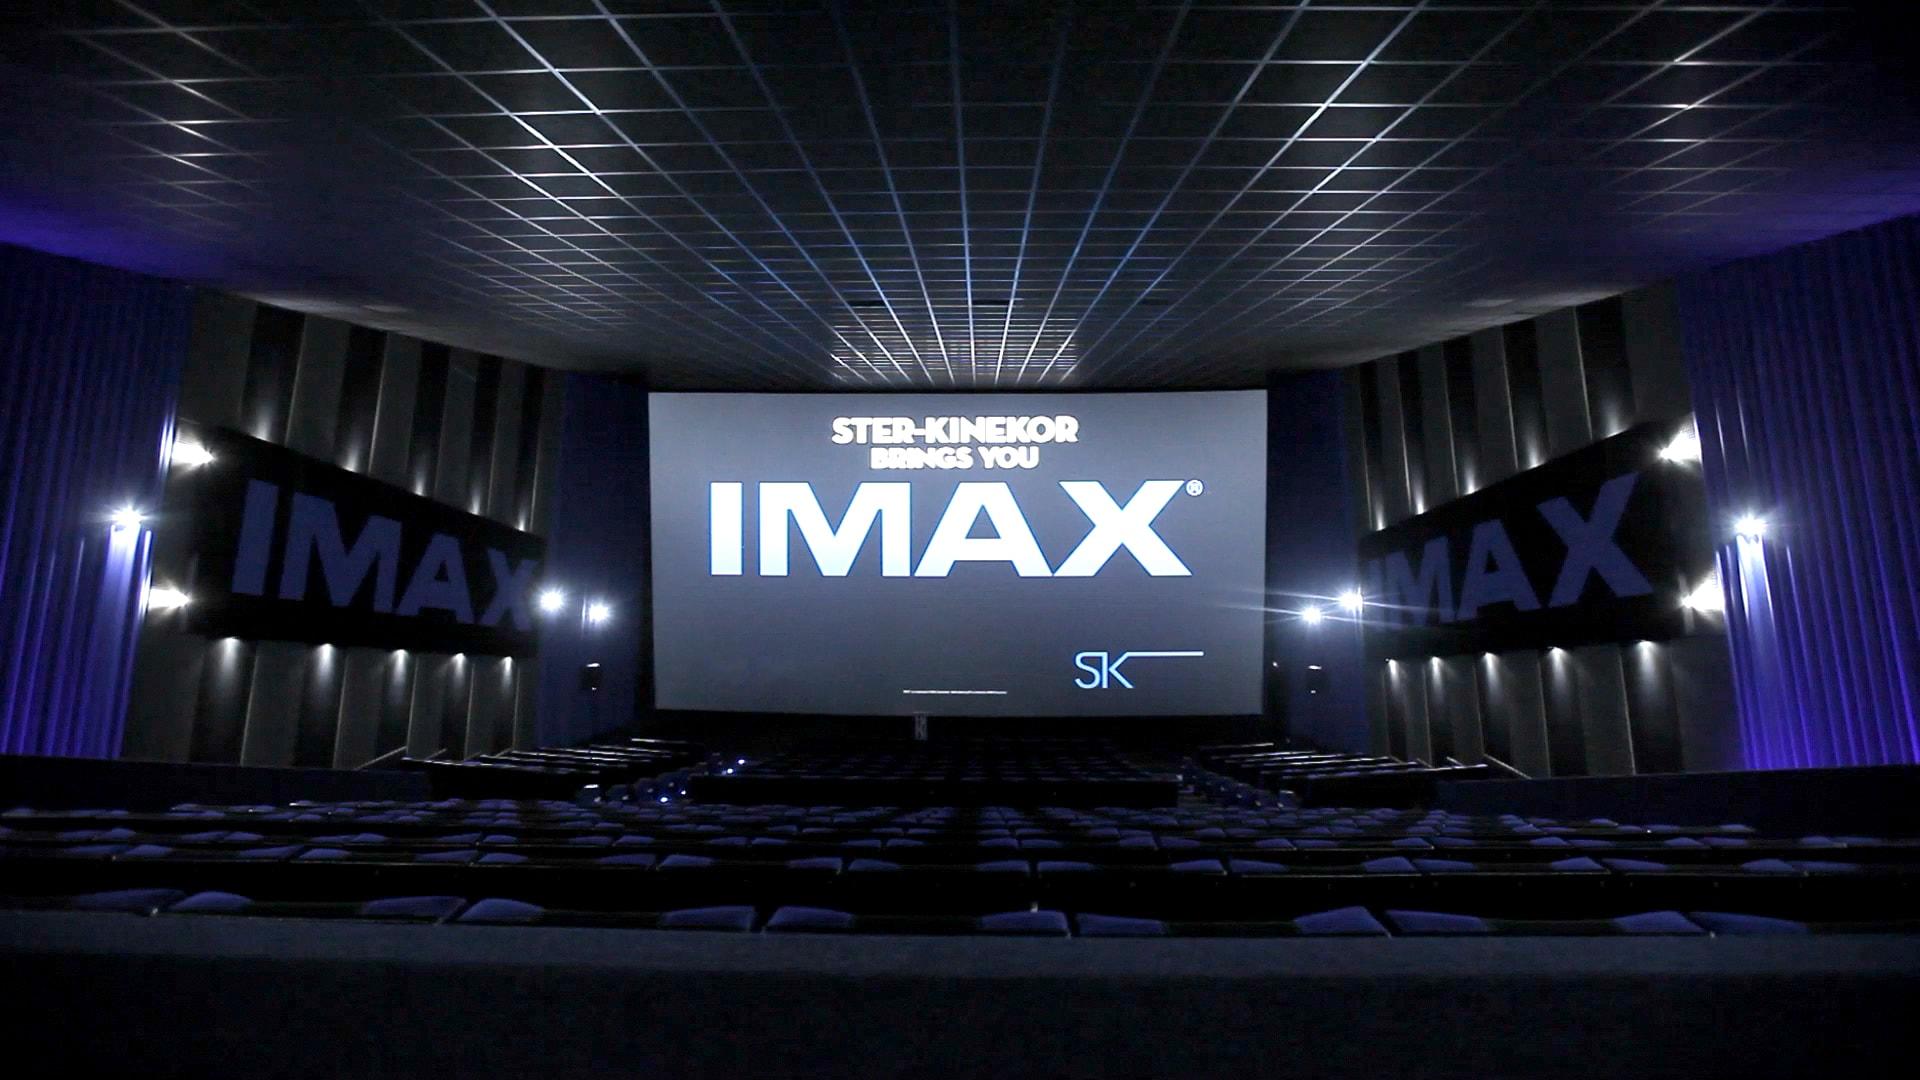 Luxury Cinemas In Cape Town Sunday Times Neighbourhood -> Fotos De Cinemas